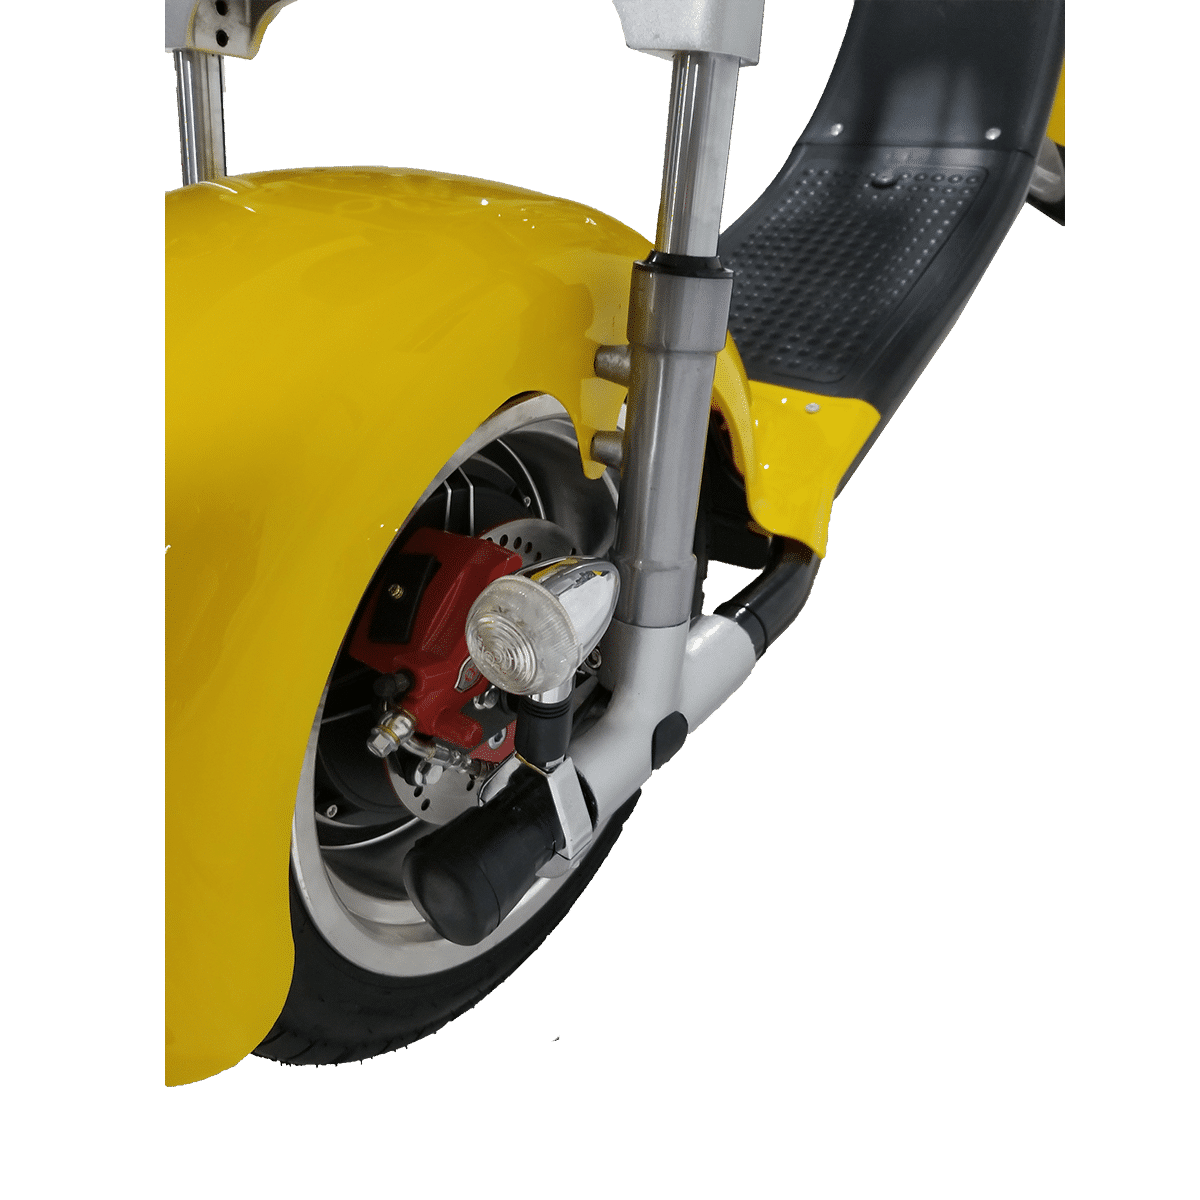 Citycoco Harley Deluxe Jaune avec 1 batterie offerte en plus 12